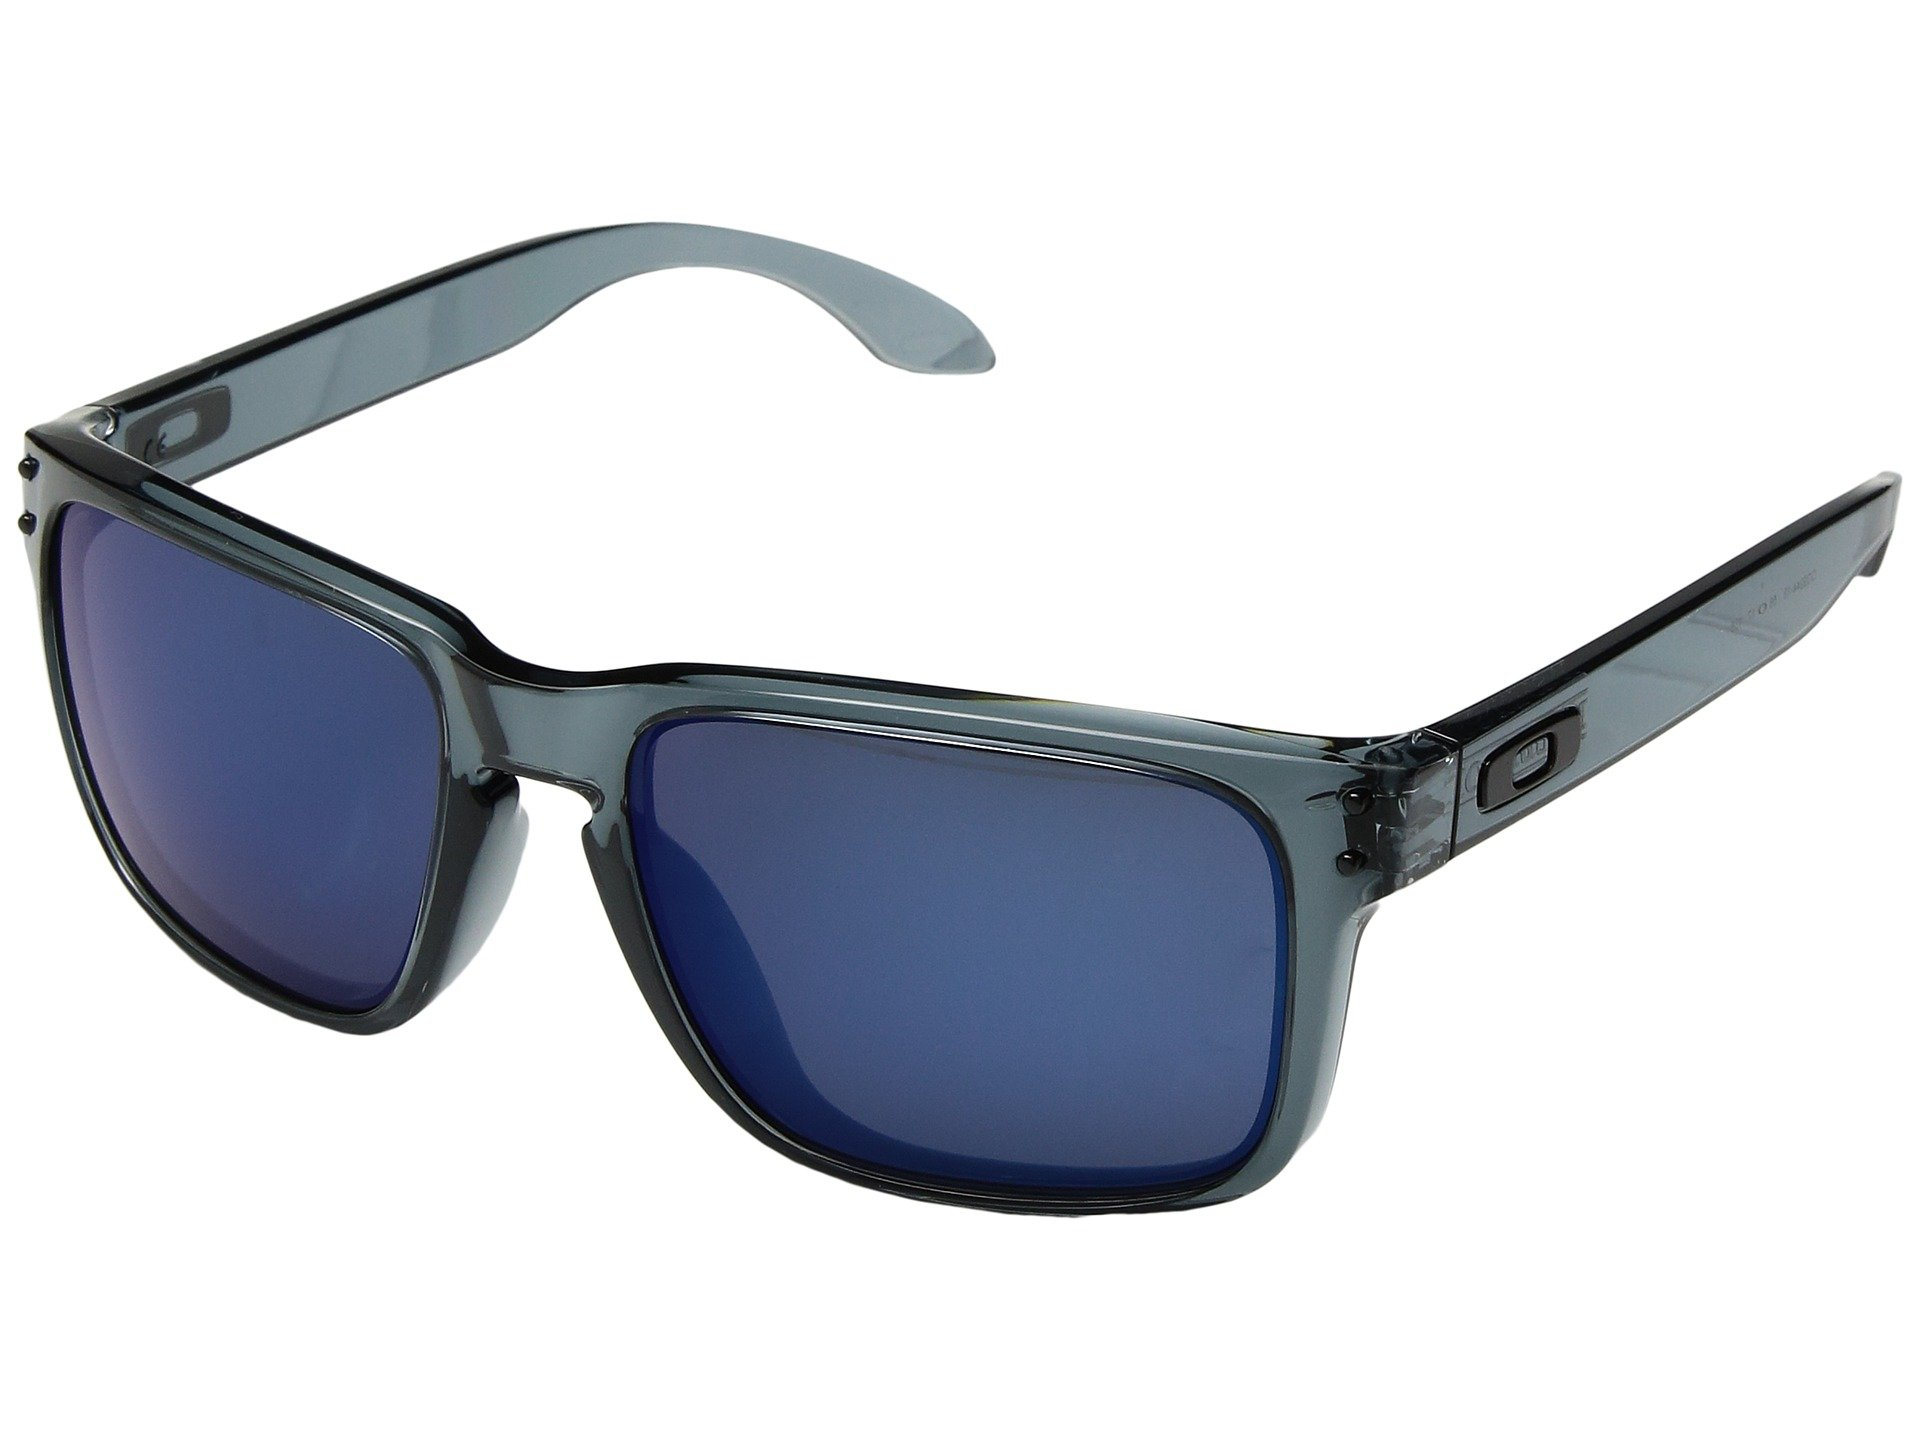 Gafas para Hombre Oakley (A) Holbrook  + Oakley en VeoyCompro.net